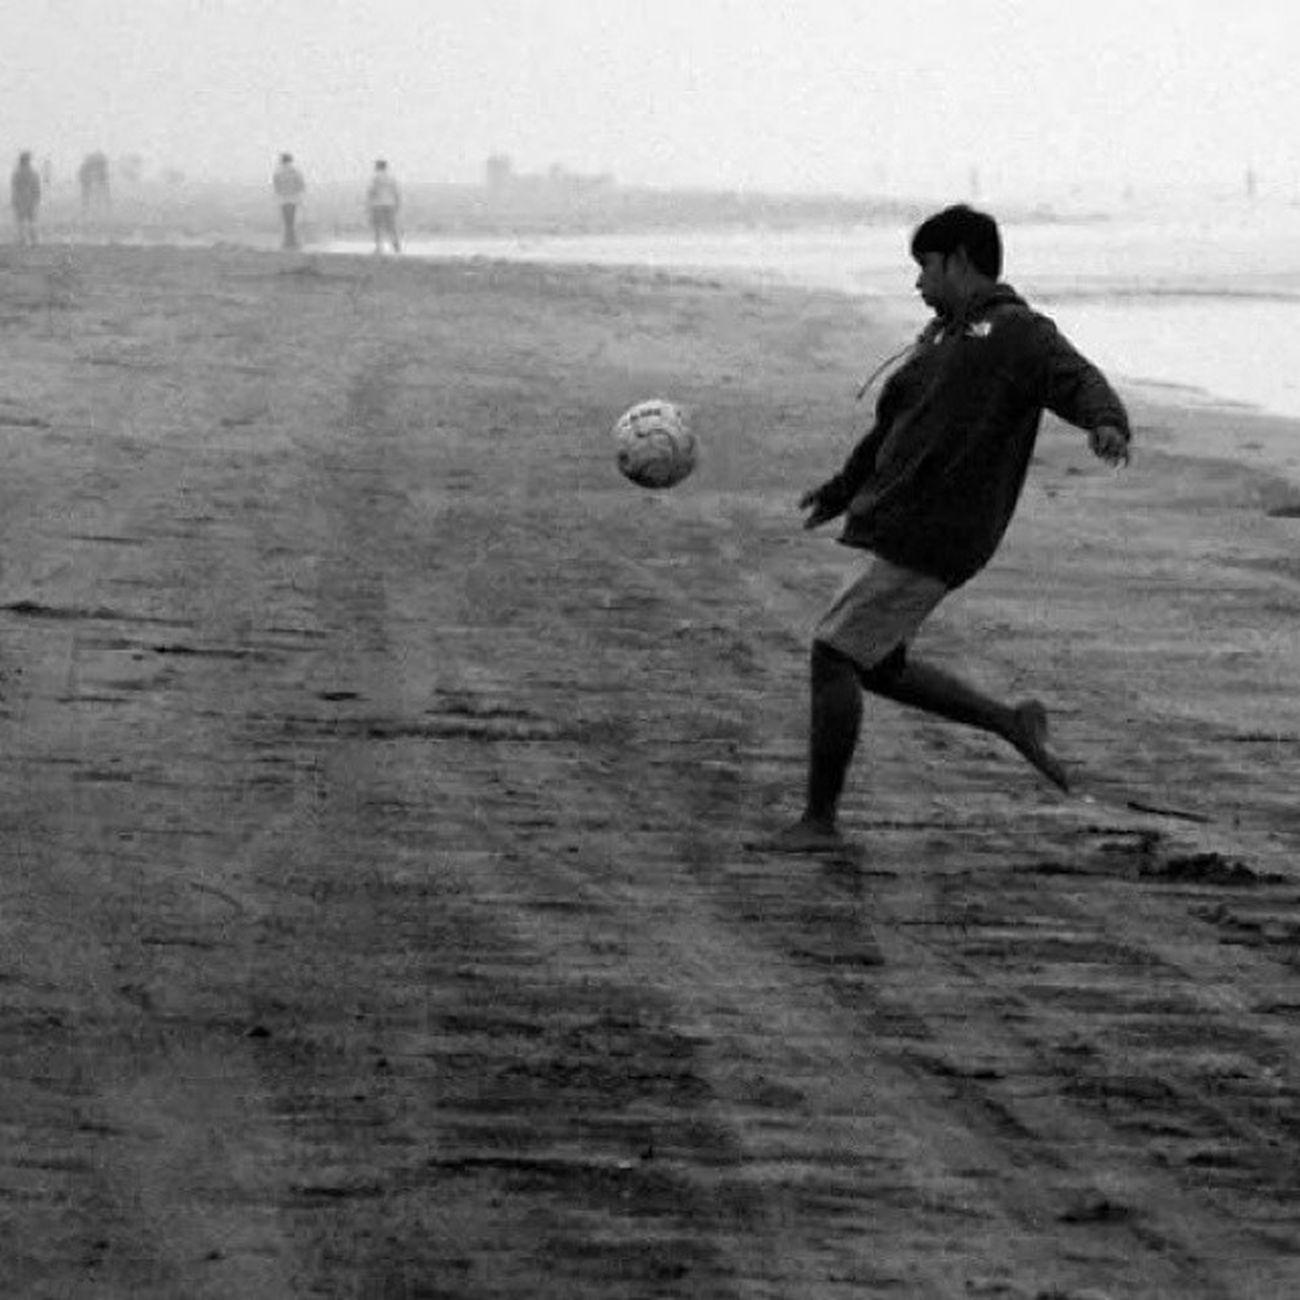 The beautiful game being played at Diveagar beach, Maharashtra. Indianbeaches Indians  Incredibleindia India travelbug travel wanderlust football sports